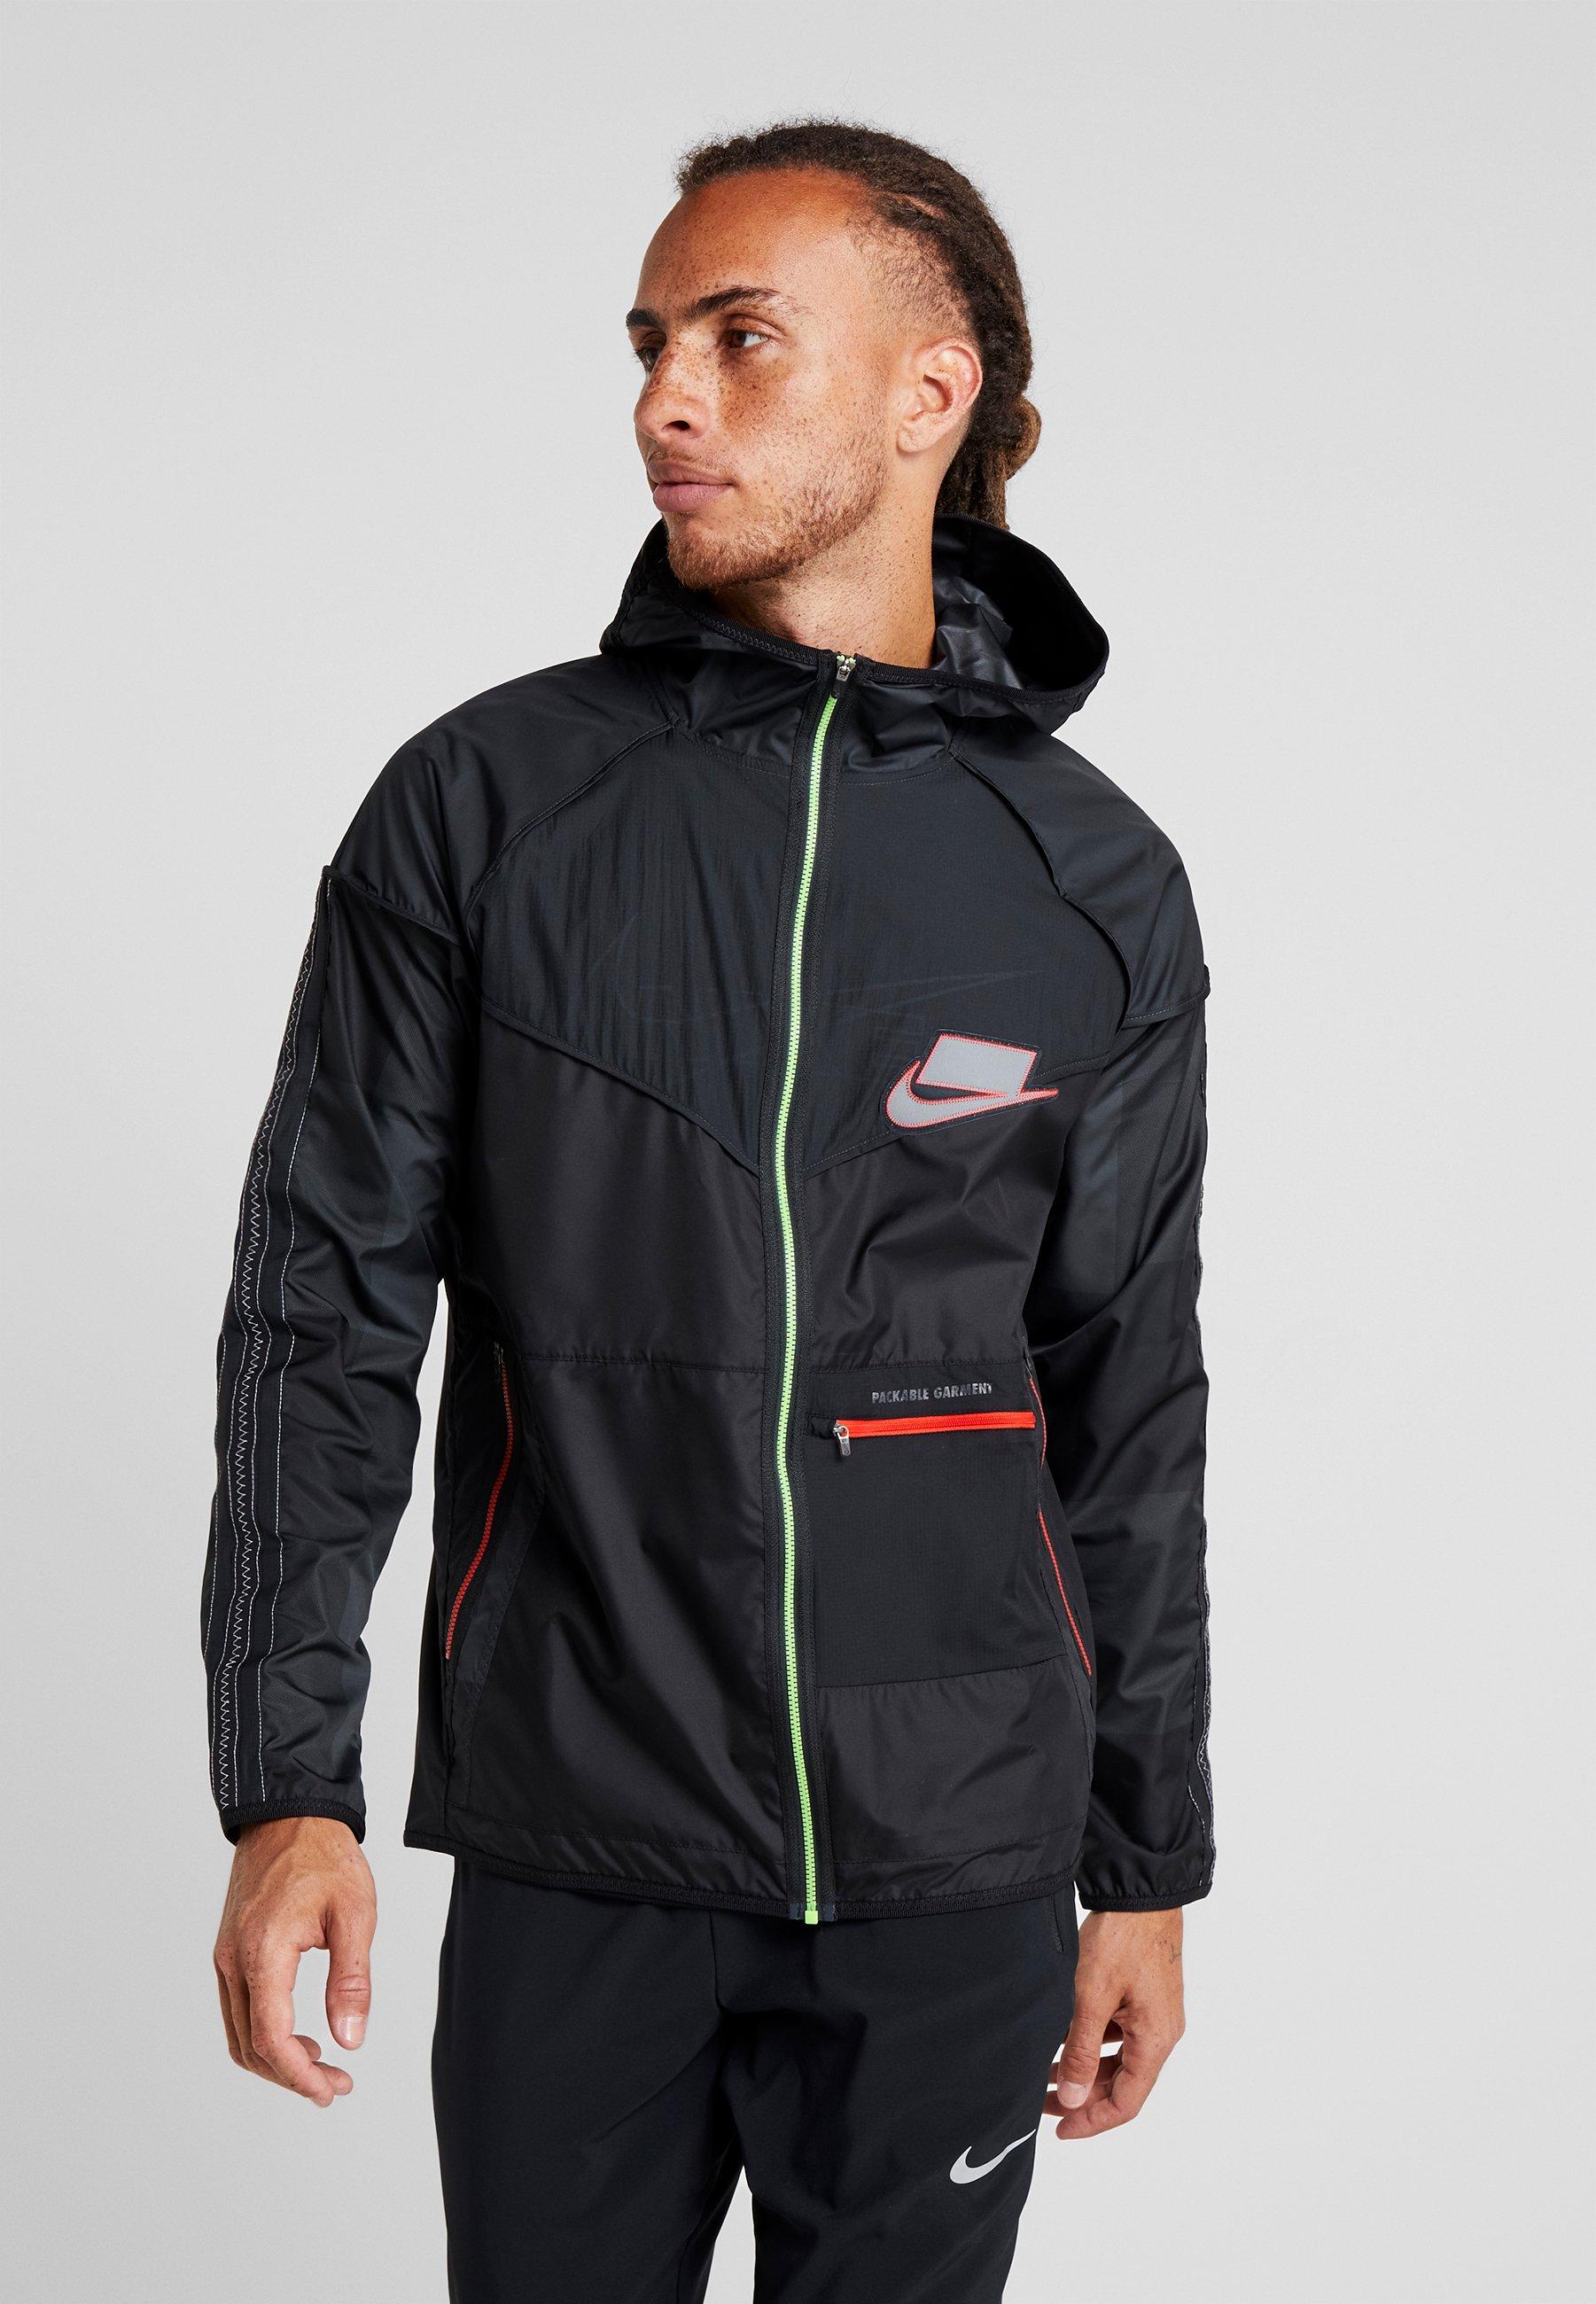 Noir De Performance reflective RunVeste Running Off Silver Nike Wild black hQdCstrx